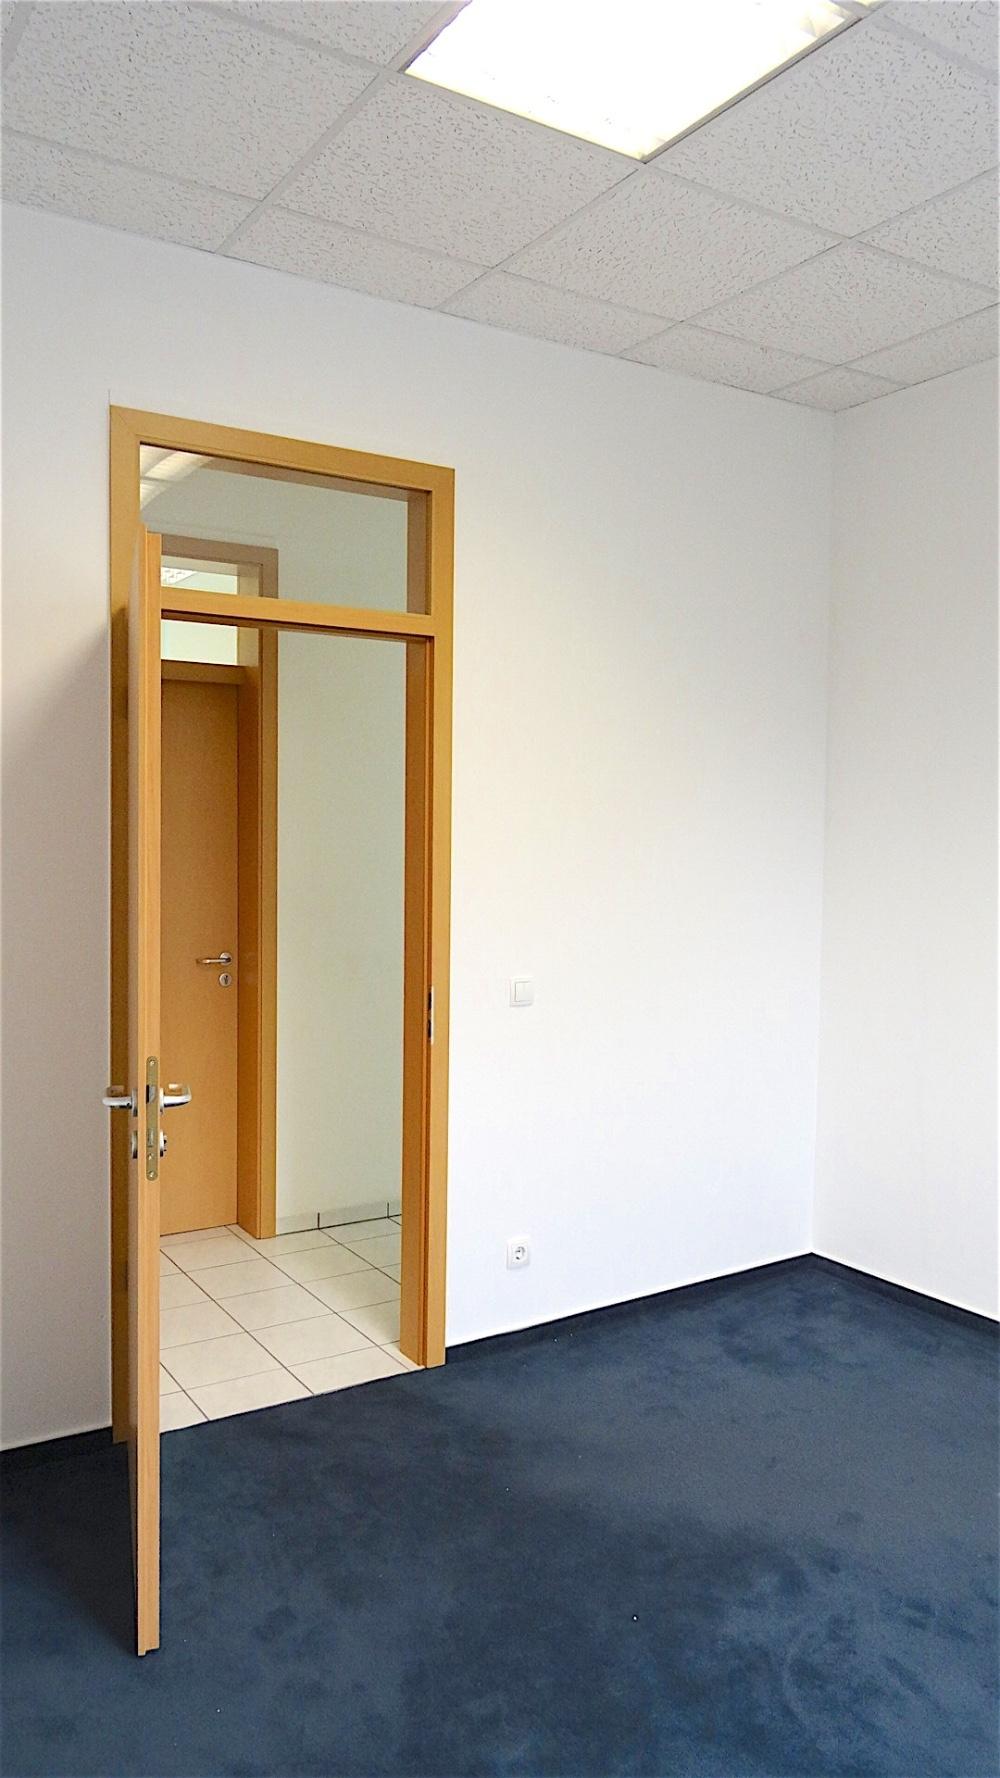 08 Büro Innen 3